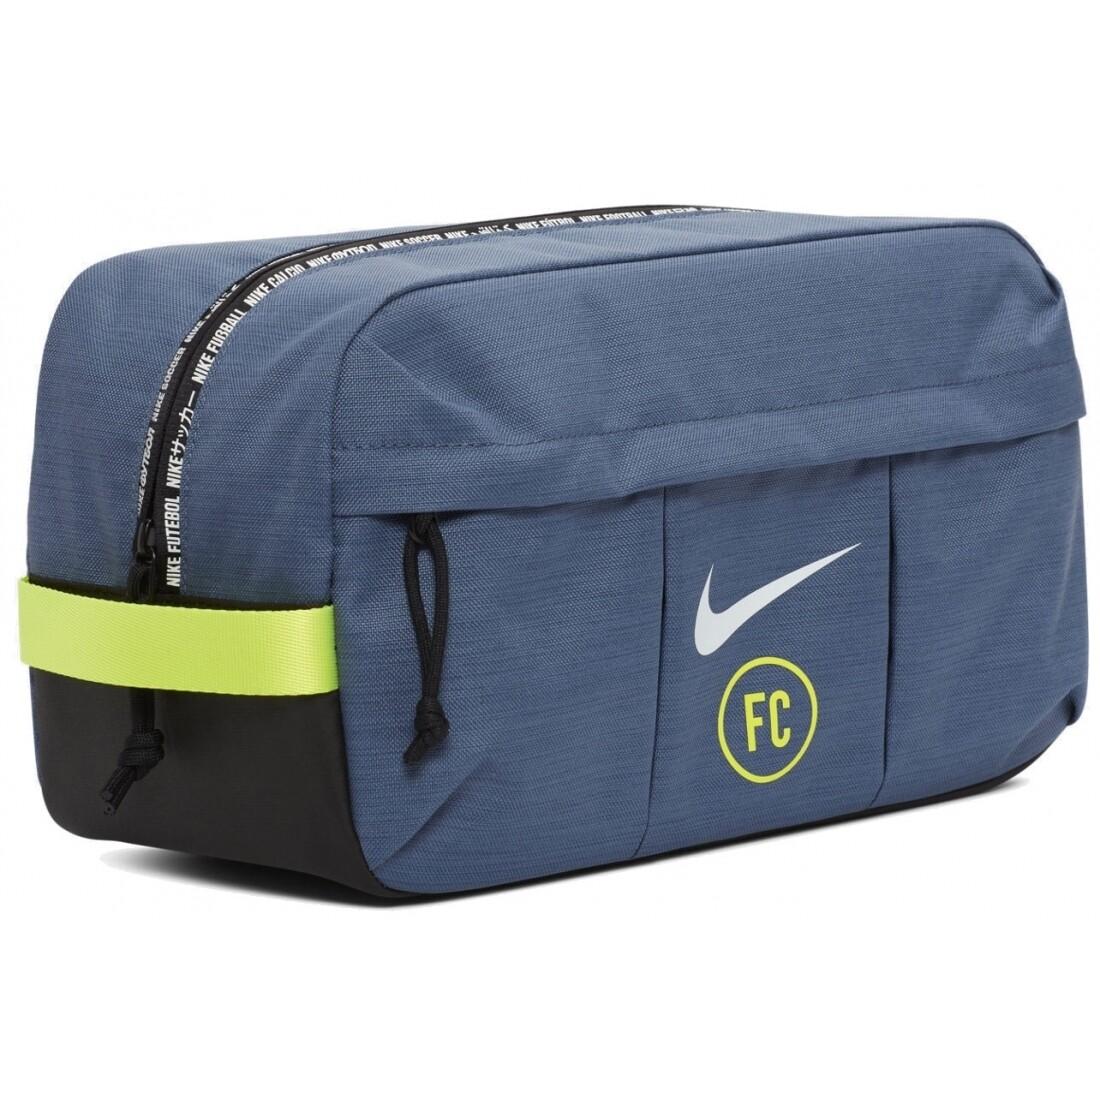 Taquera Nike Difussed Blue/Black